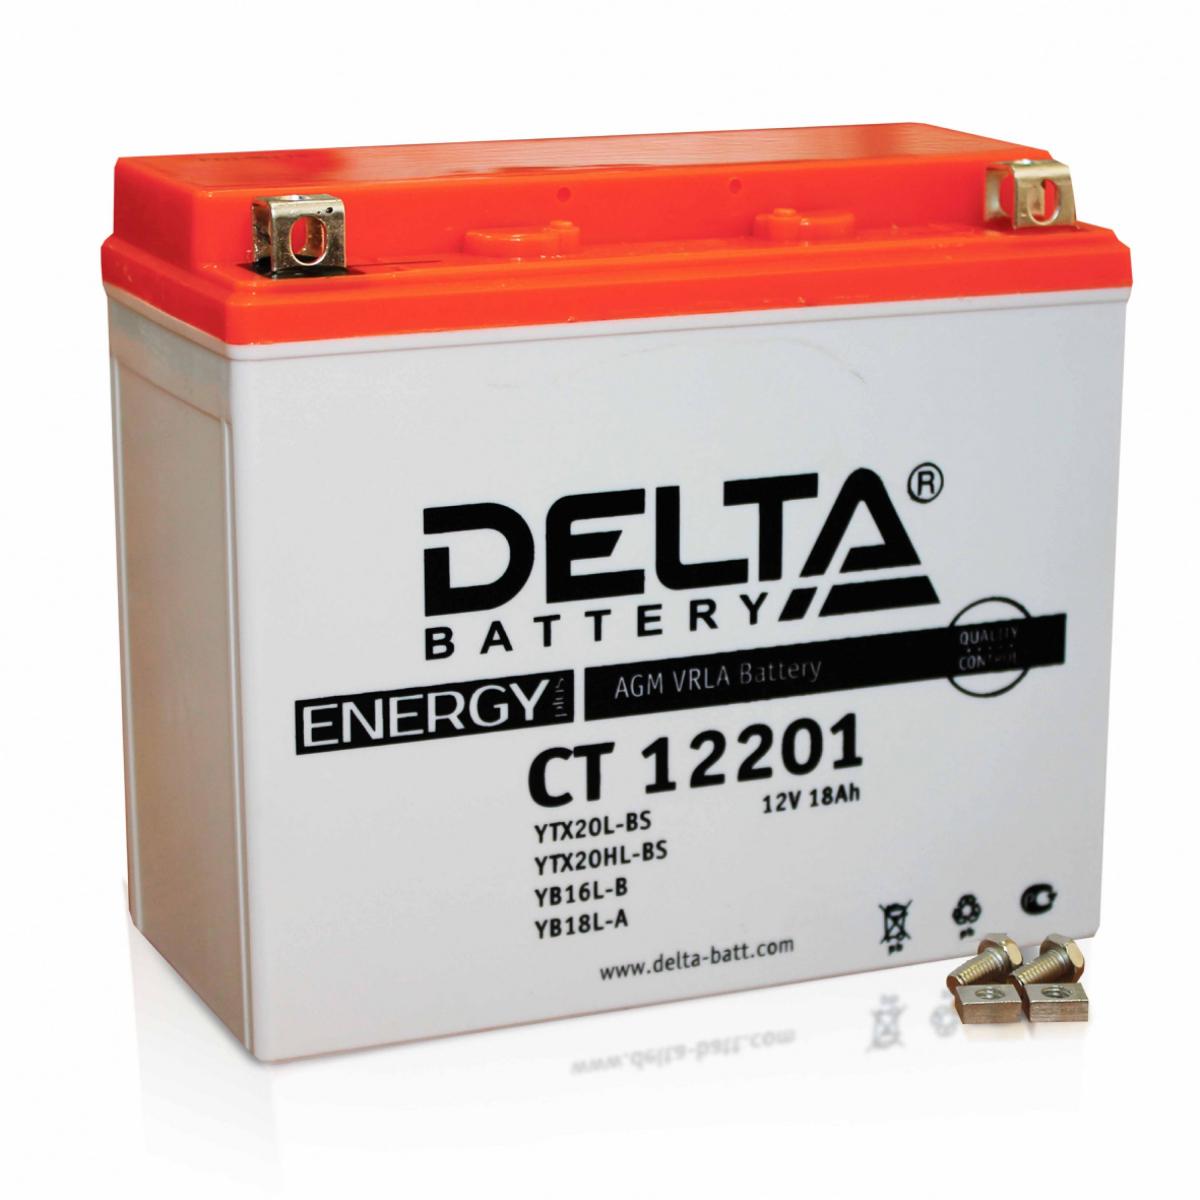 DELTA CT12201 (YTX20L-BS, YTX20HL-BS, YB16CL-B, YB16L-B, YB18L )